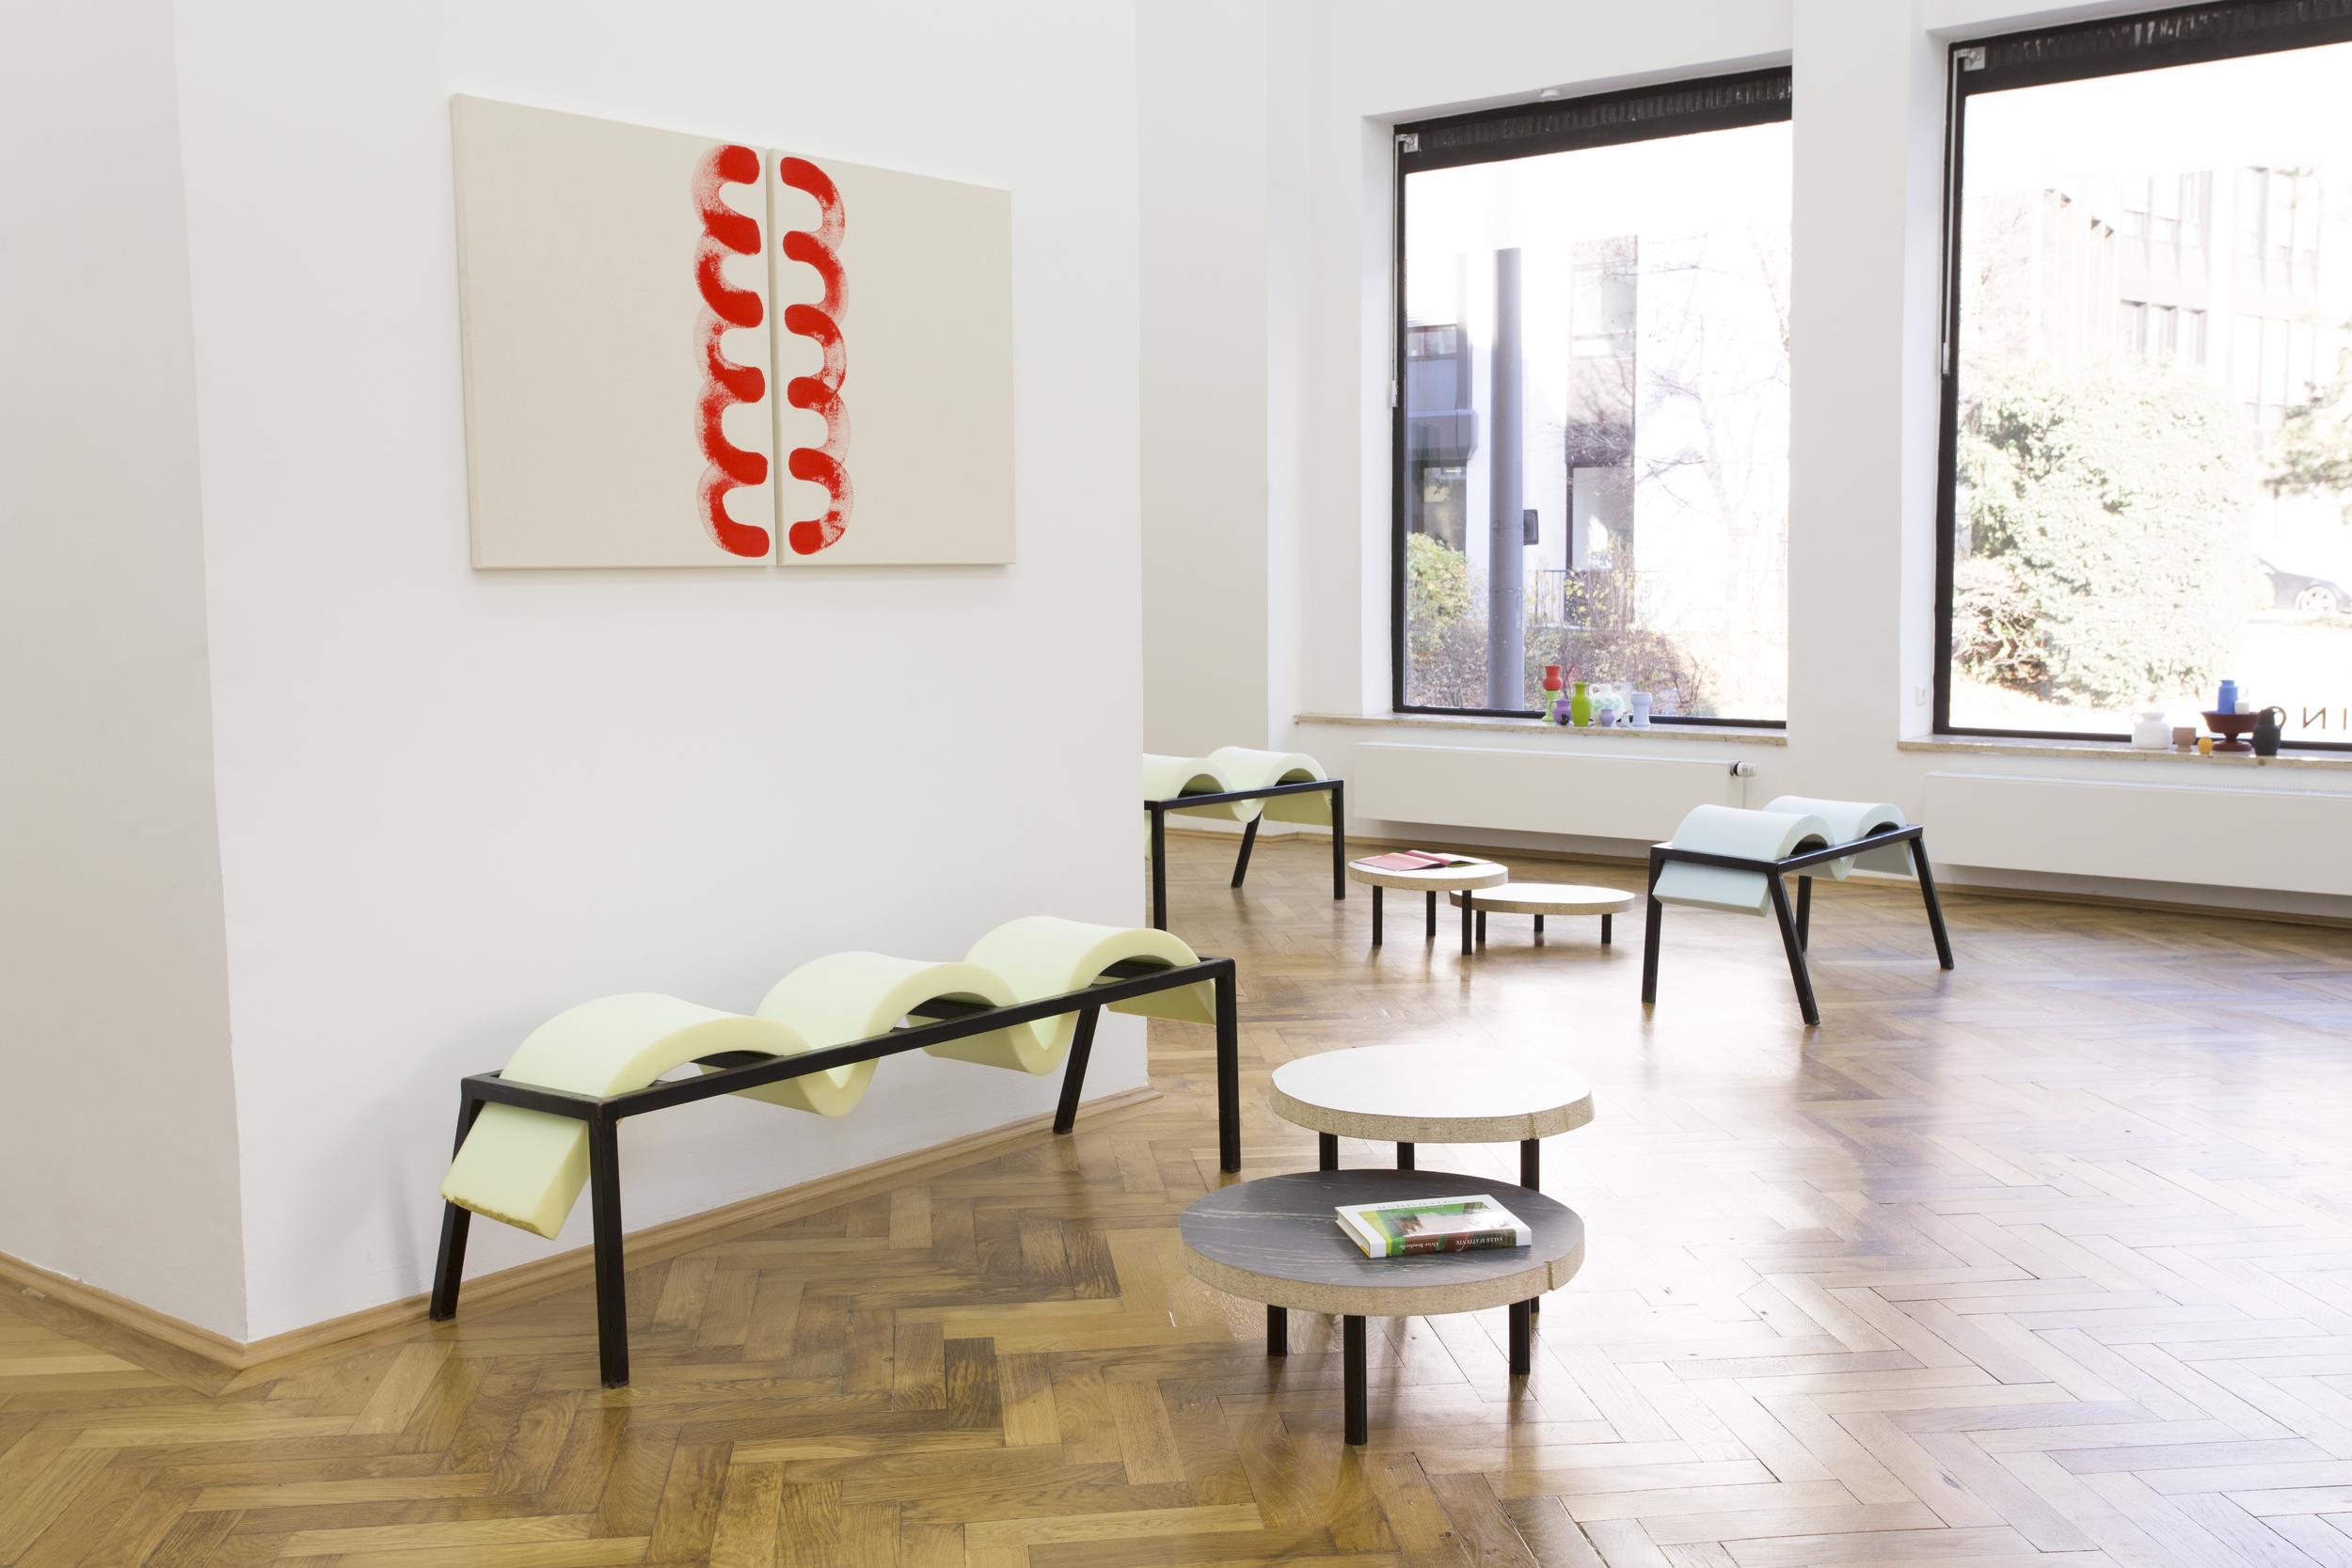 Elvire Bonduelle - waiting room #4 - installation view (Elvire Bonduelle)